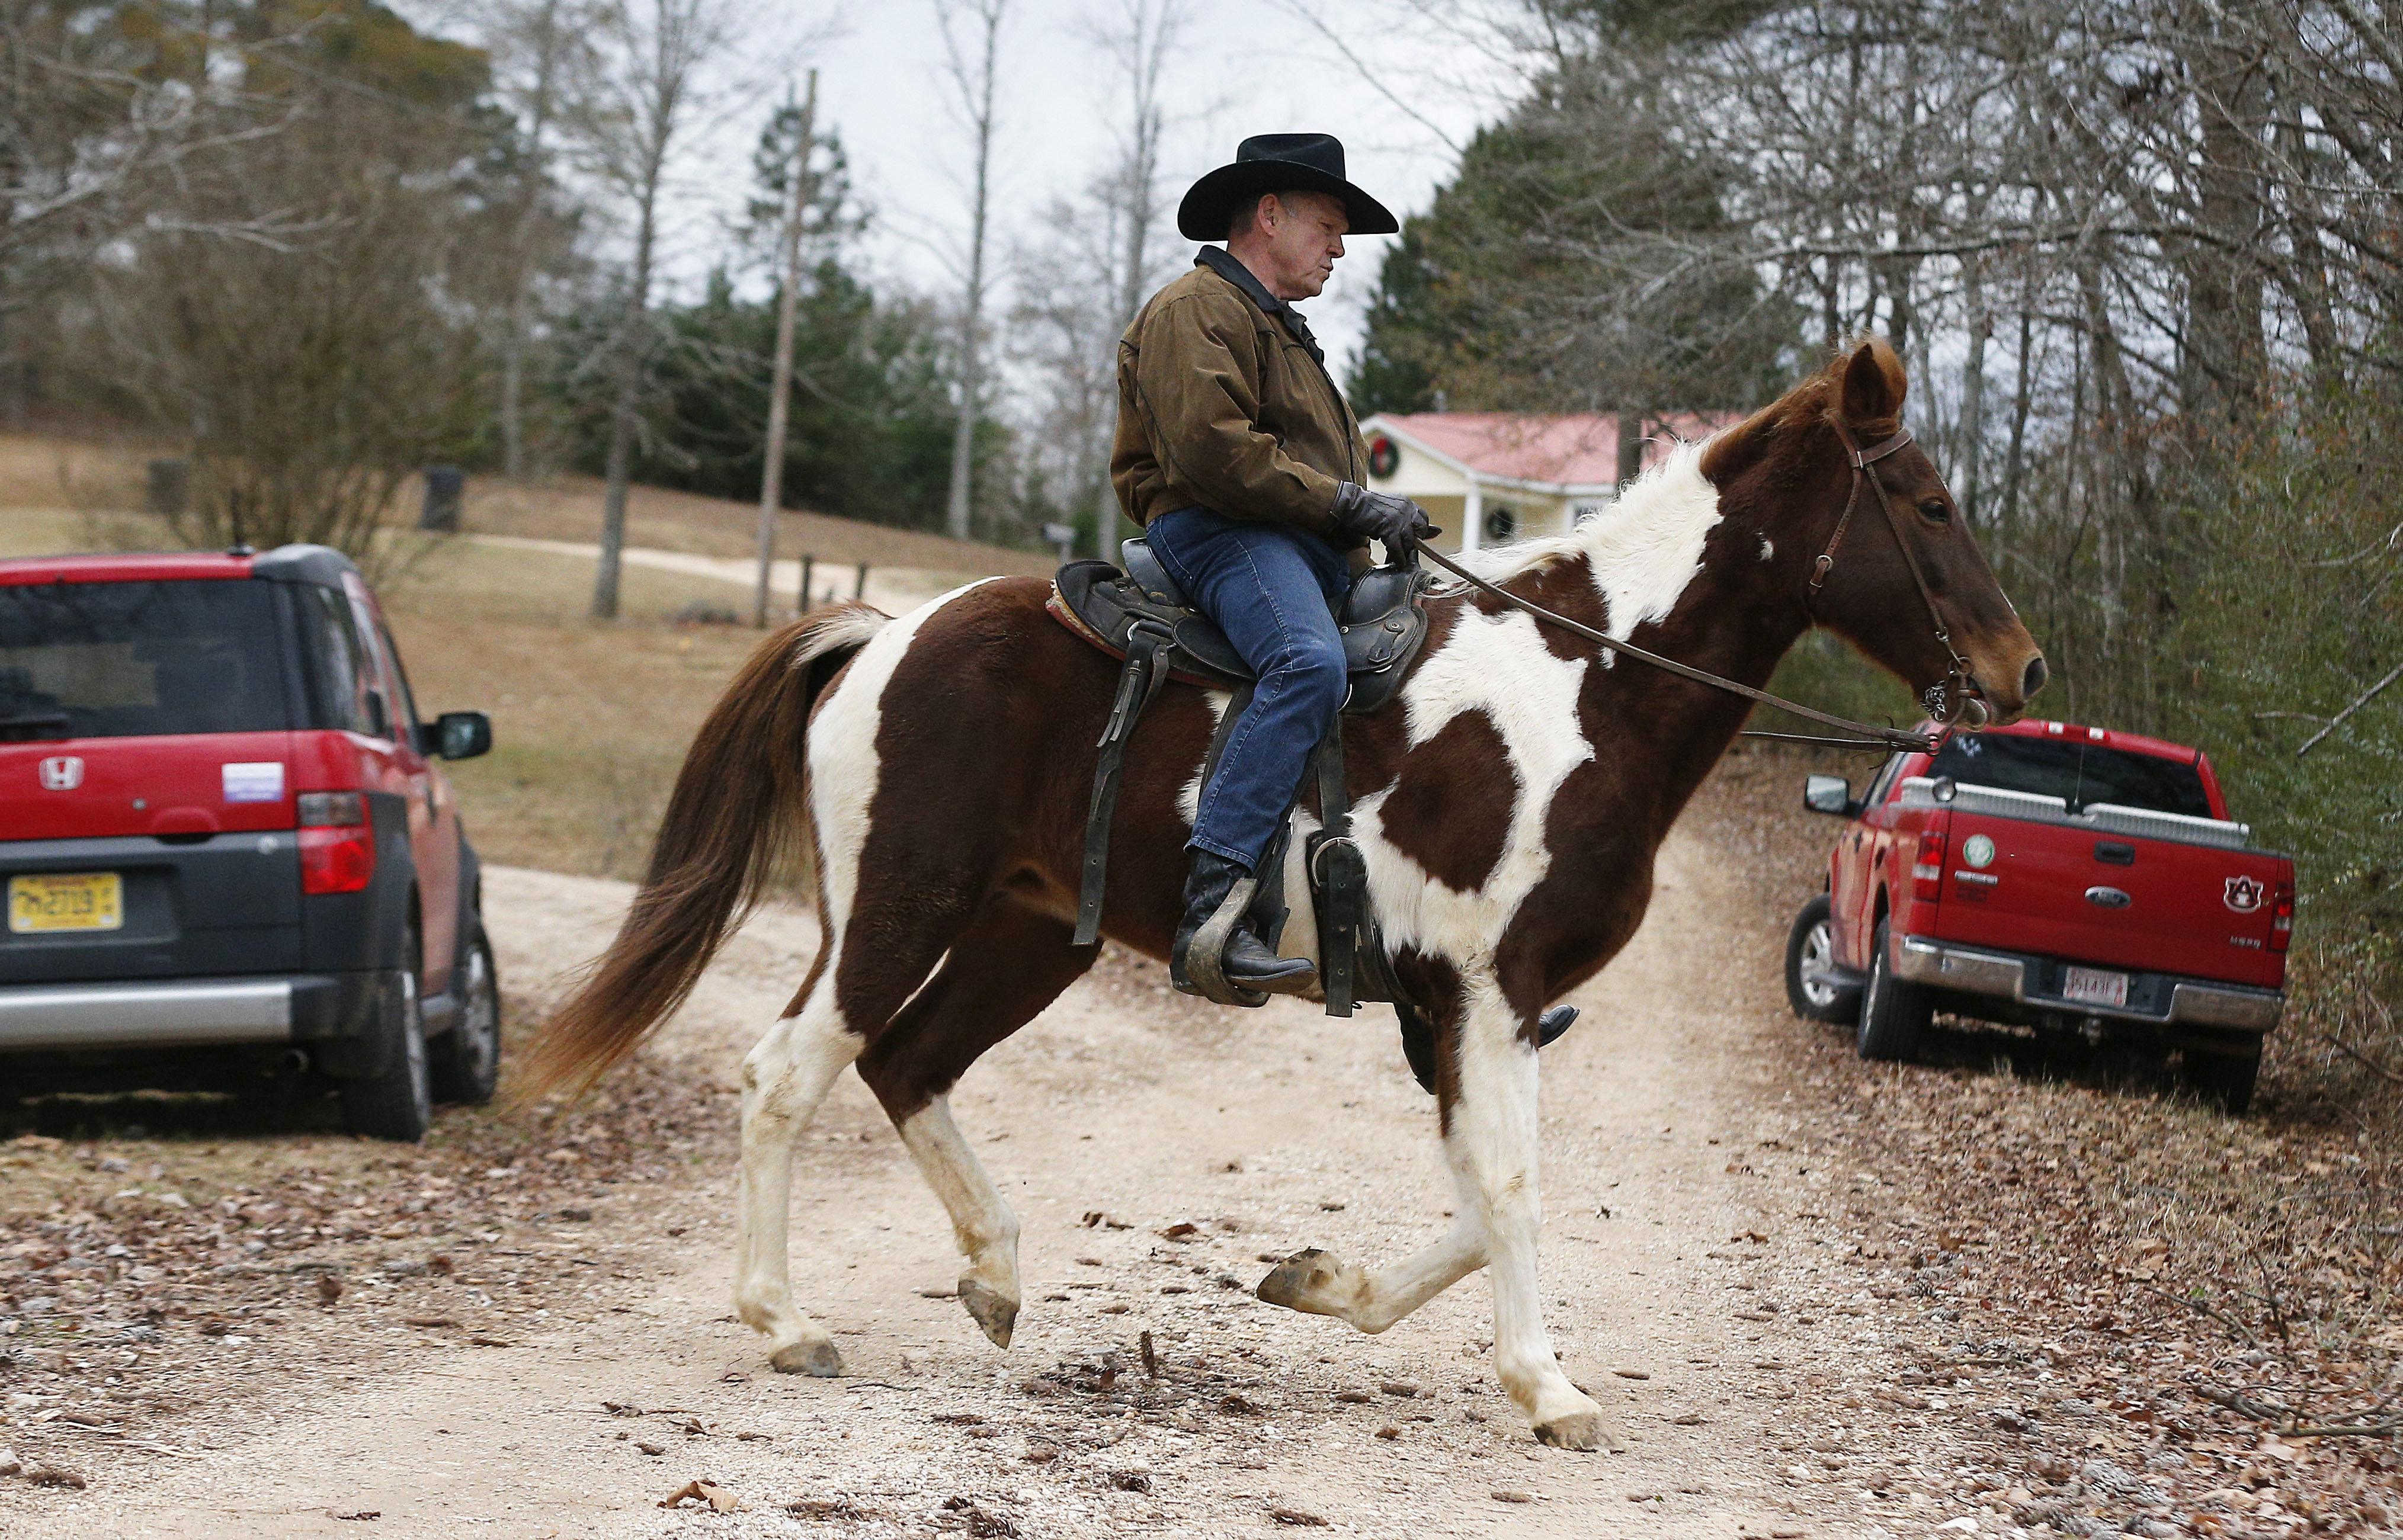 U.S. Senate Republican candidate Roy Moore rides a horse to vote, Tuesday, Dec. 12, 2017, in Gallant, Ala.